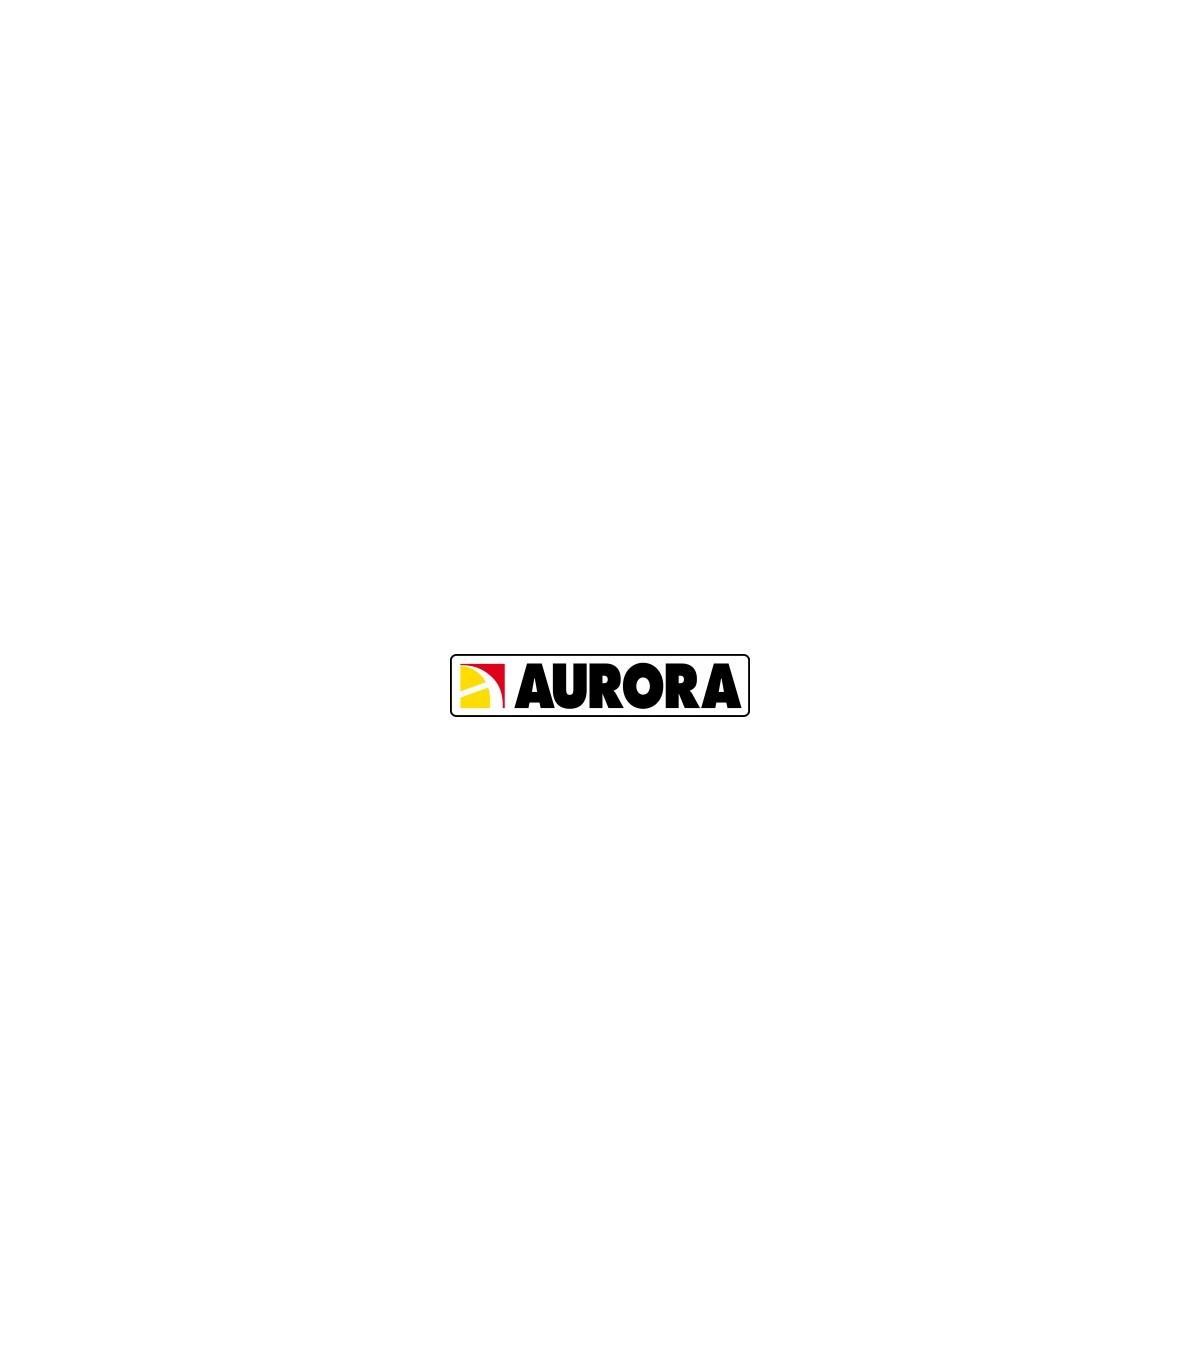 85 Qgusmzvp Set Cm Aurora Semirigida Borsa Next 4RLA3qj5